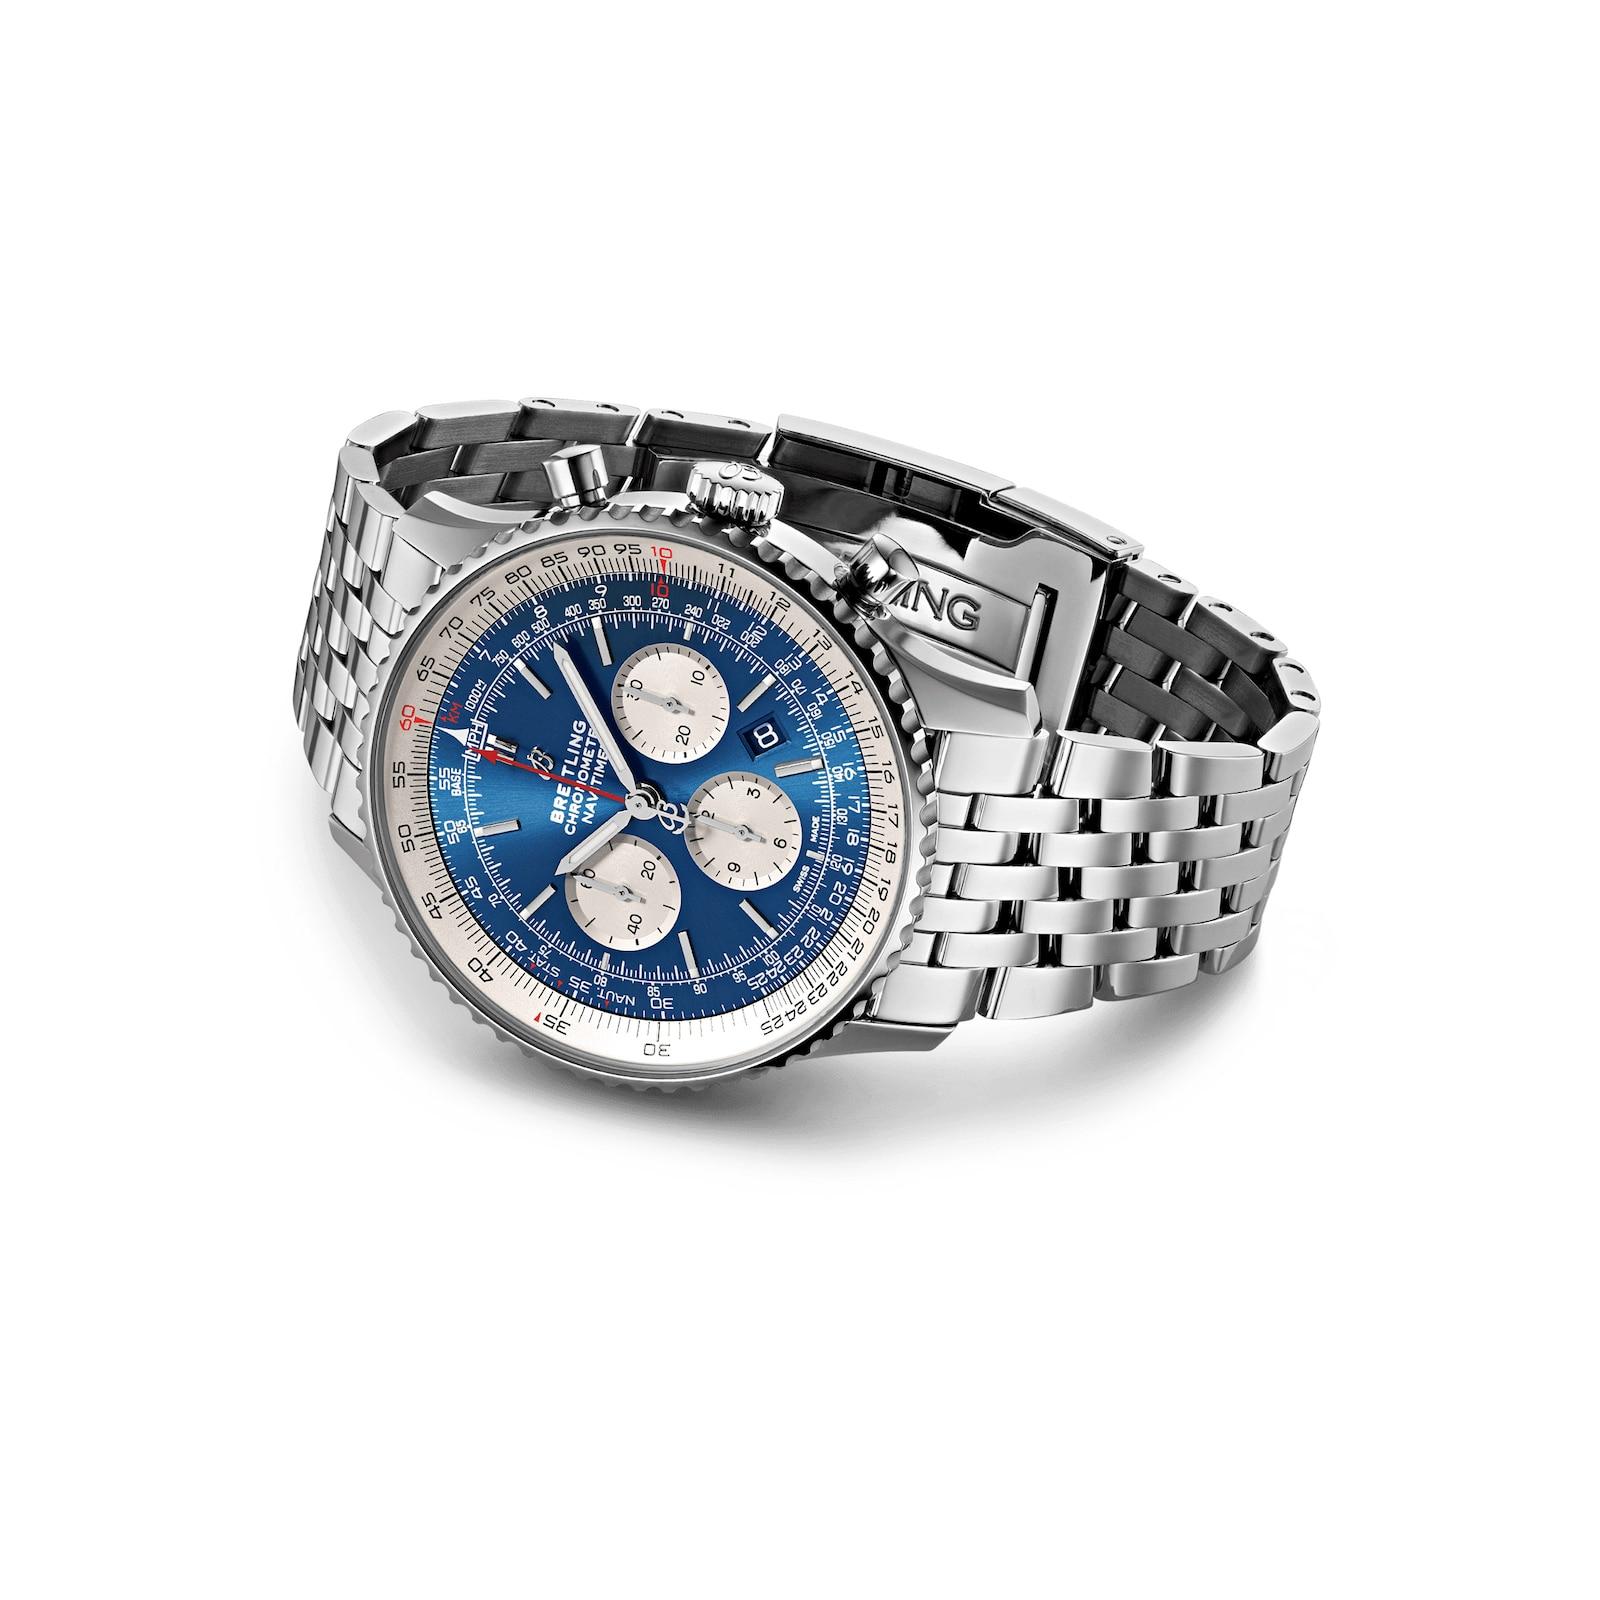 Breitling Navitimer 1 B01 Chronograph 46 Mens Watch